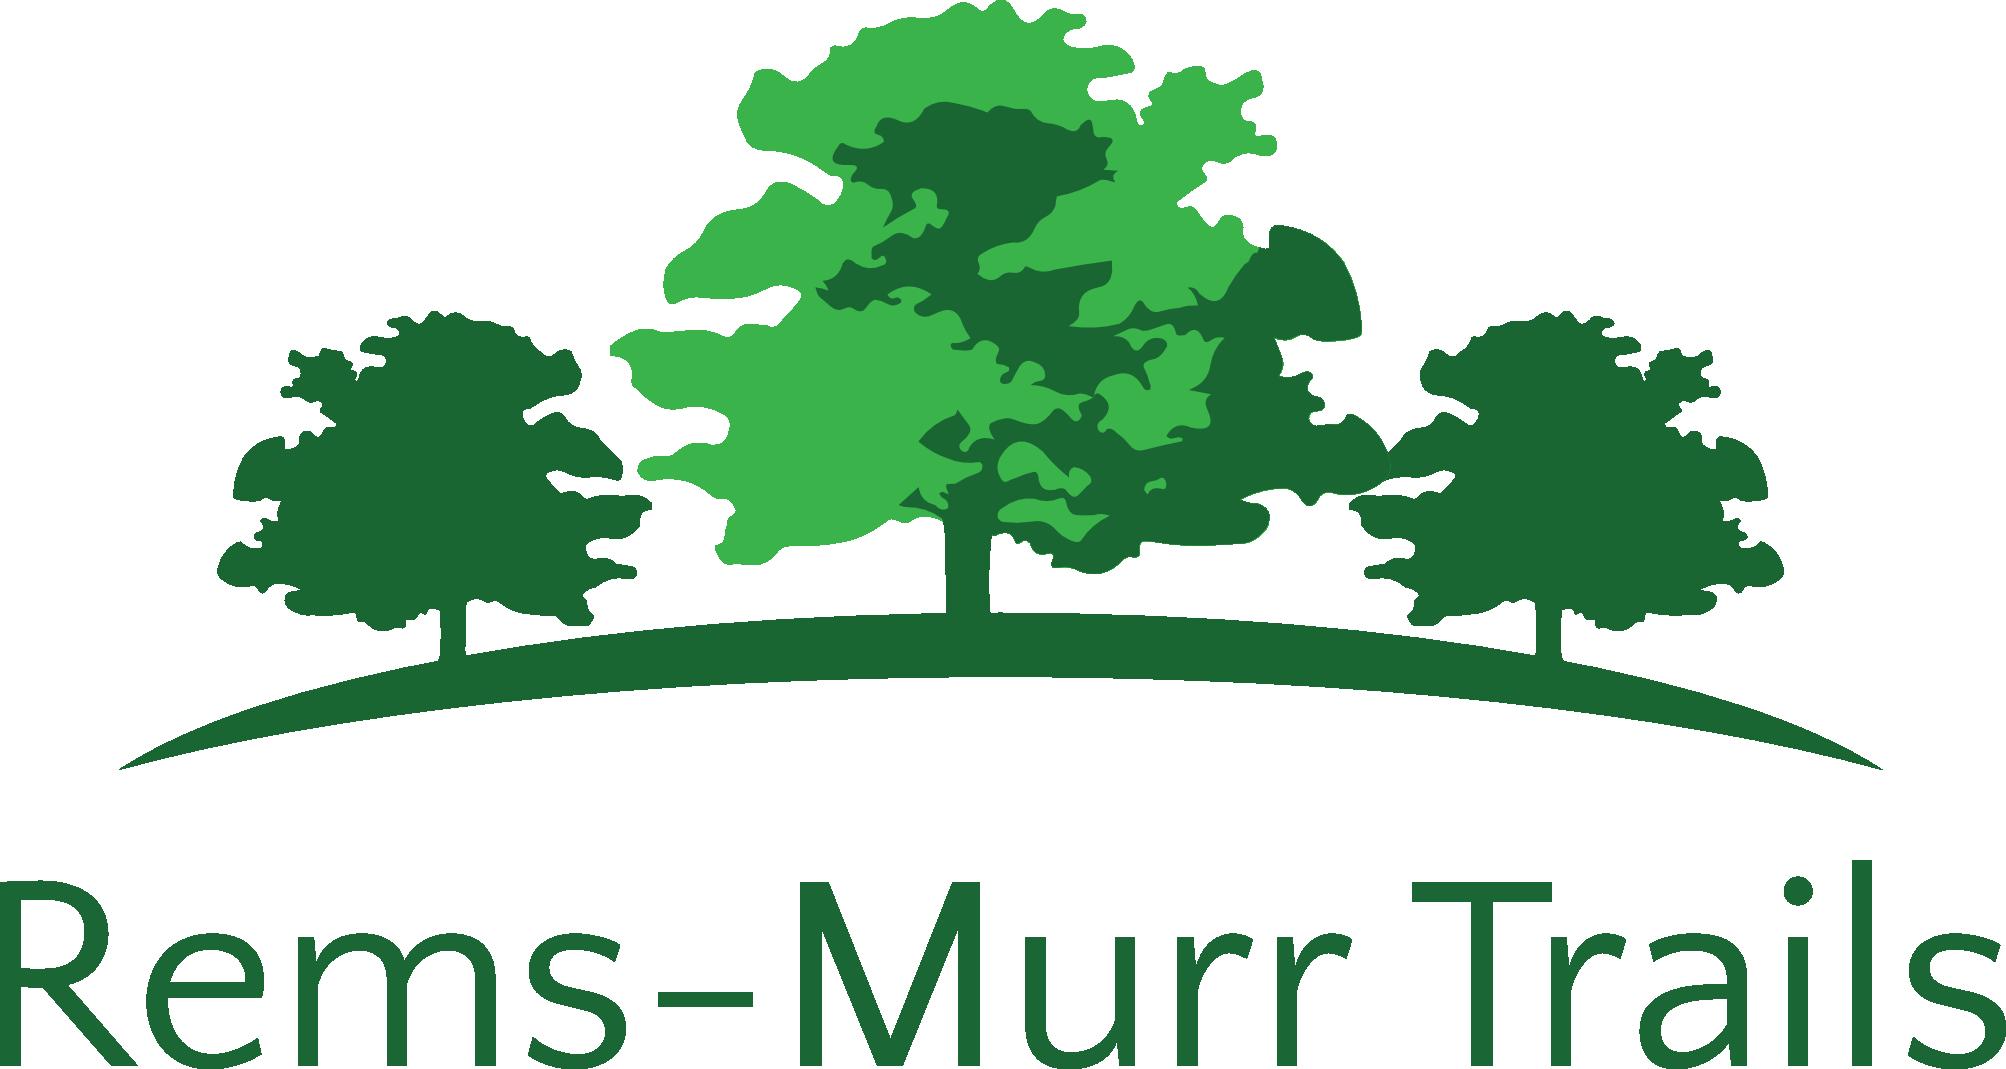 Rems-Murr Trails